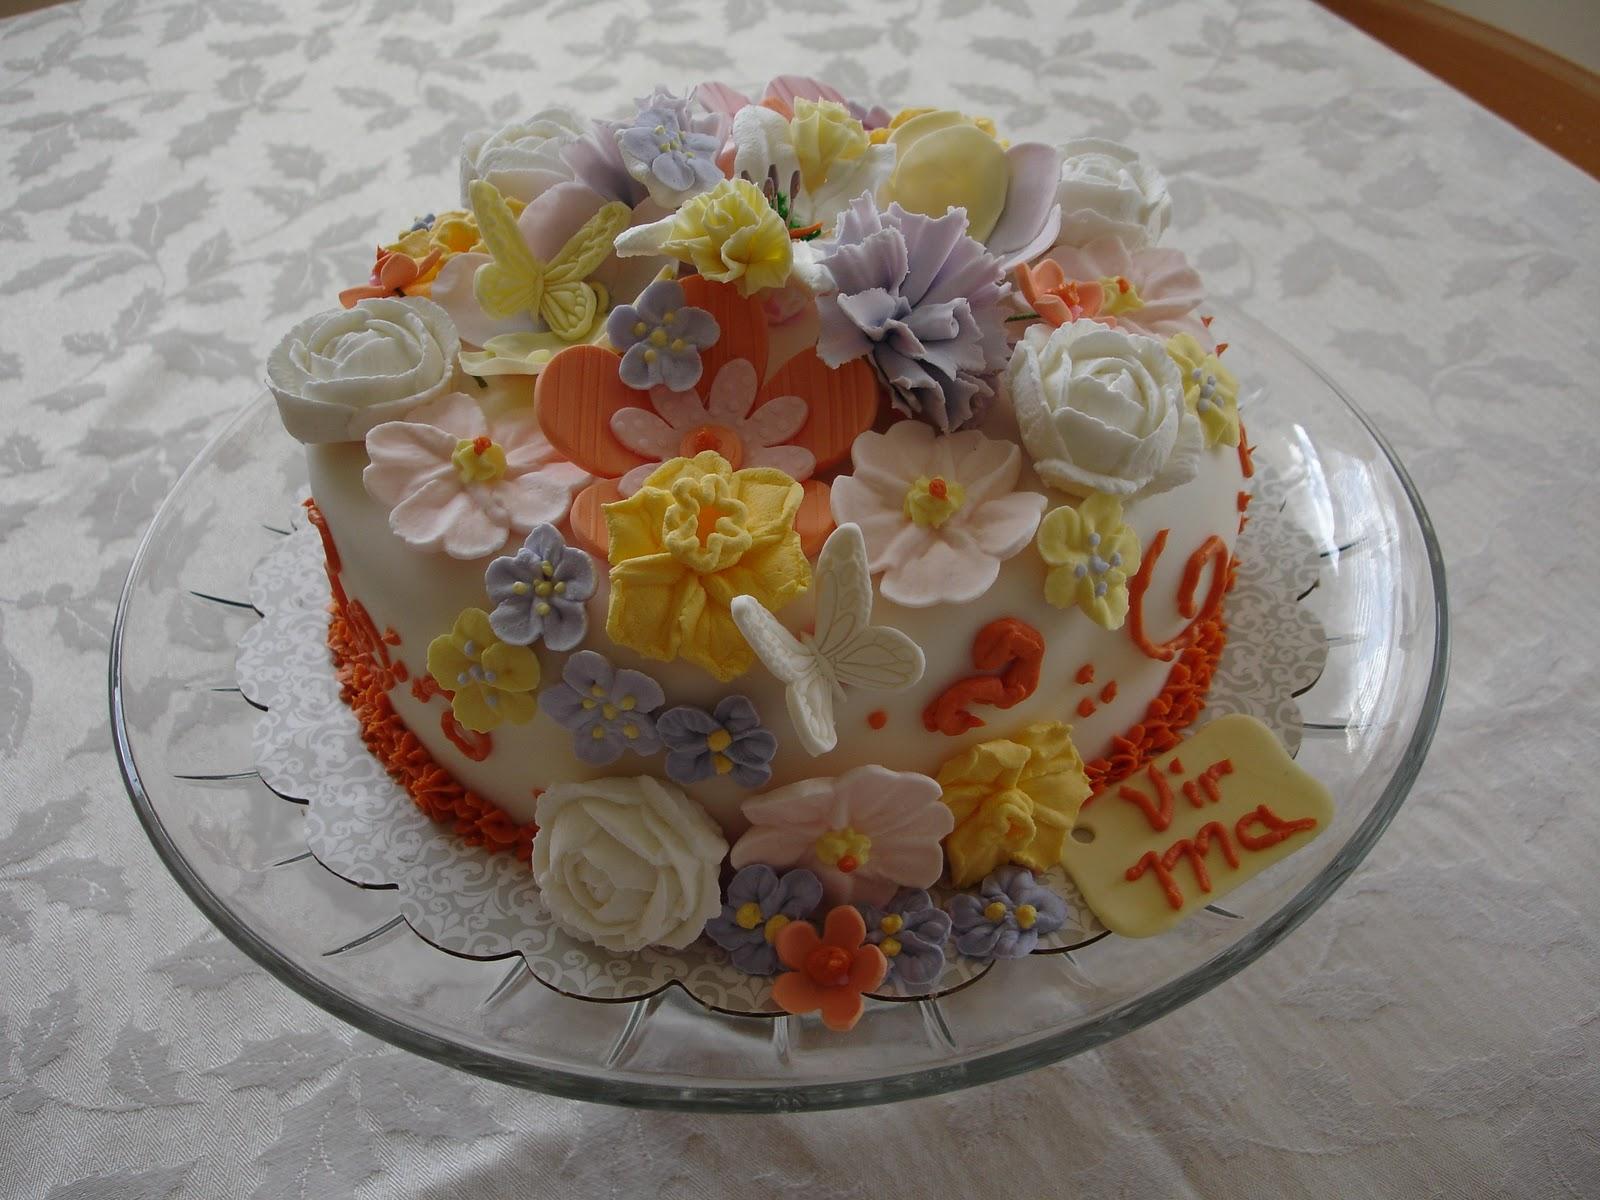 Sugar and Spice: Wilton cake decorating class II